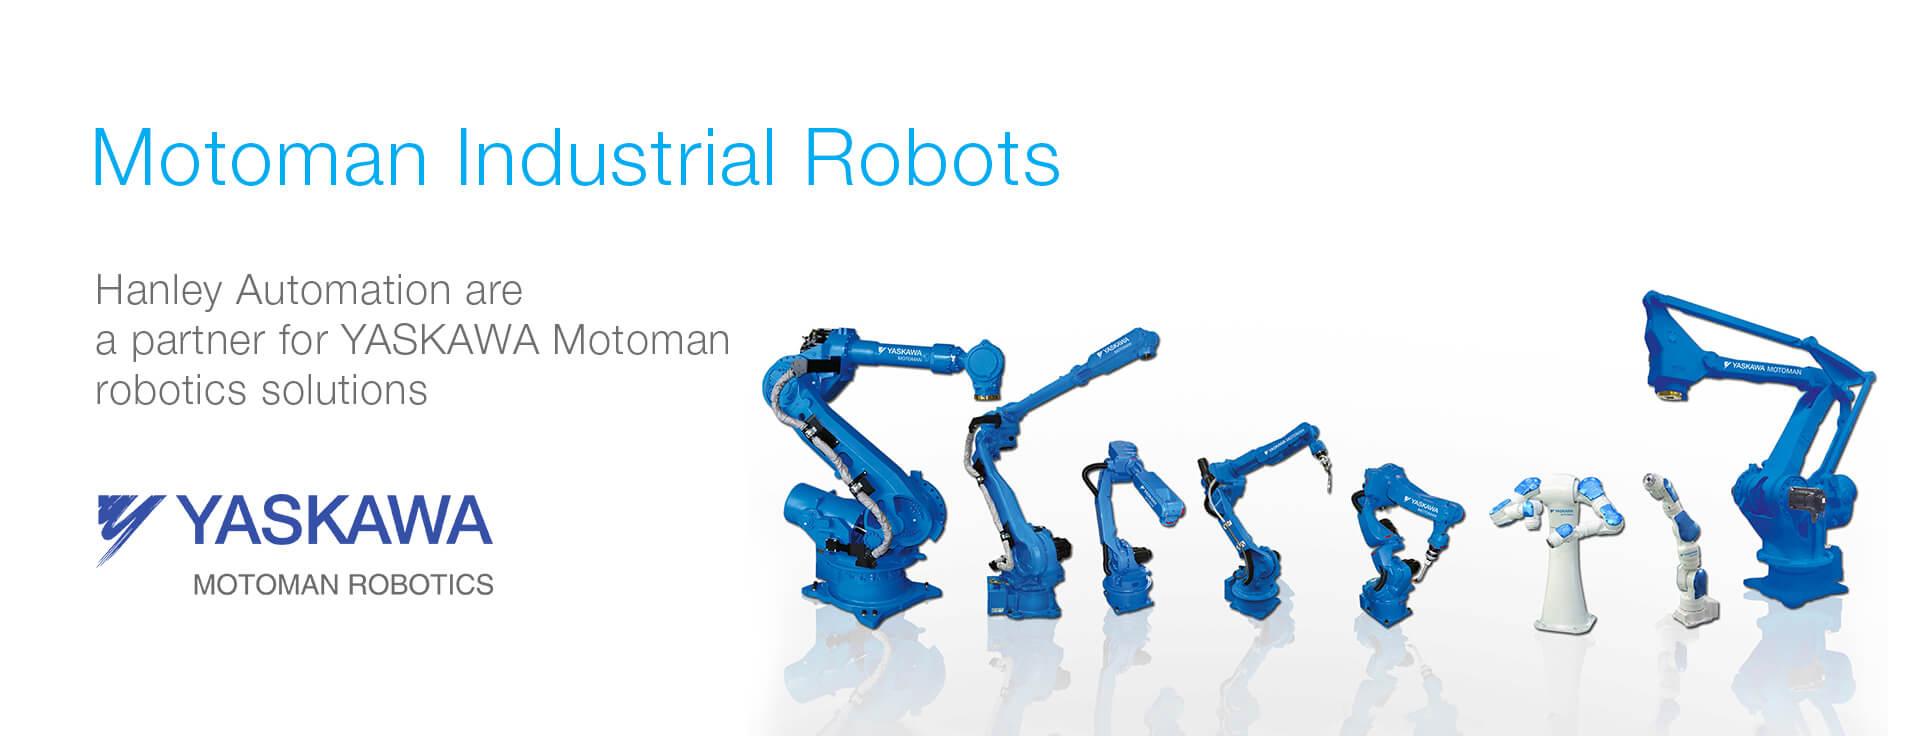 Motoman-Industrial-Robots 2 (1)